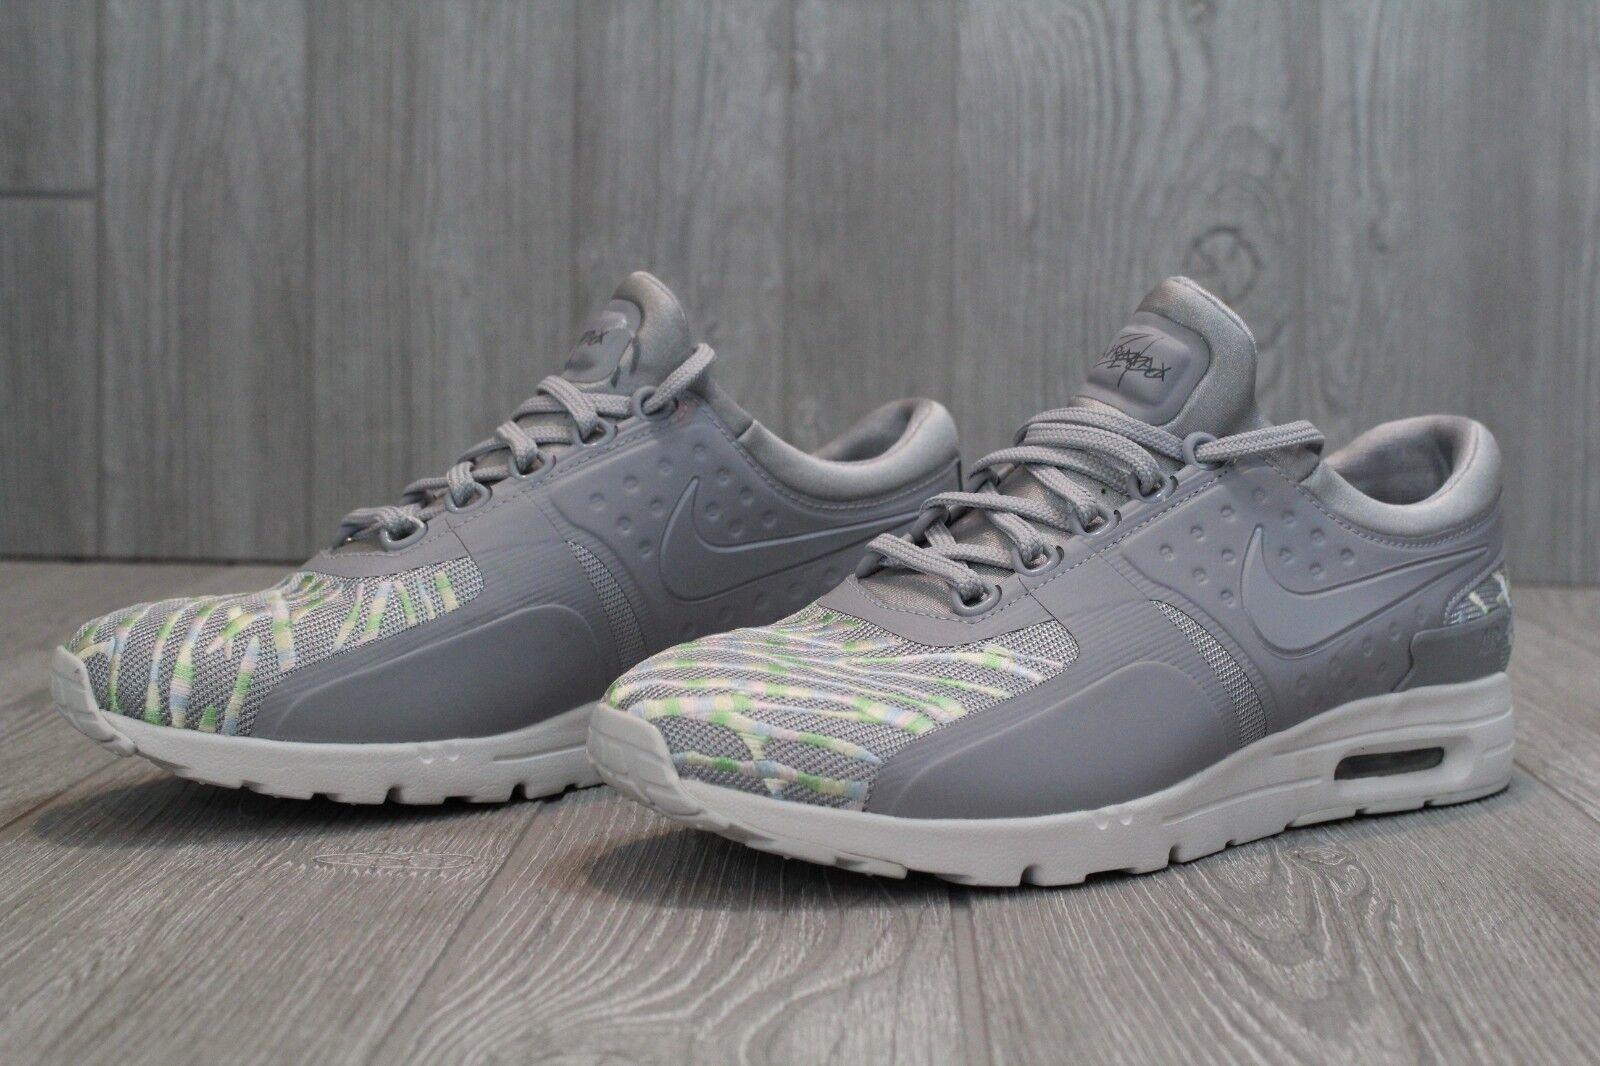 28 Zero RARE Nike Air Max Zero 28 Sample SE Grey Rainbow Shoes 896199 001 Size 9 0b339c